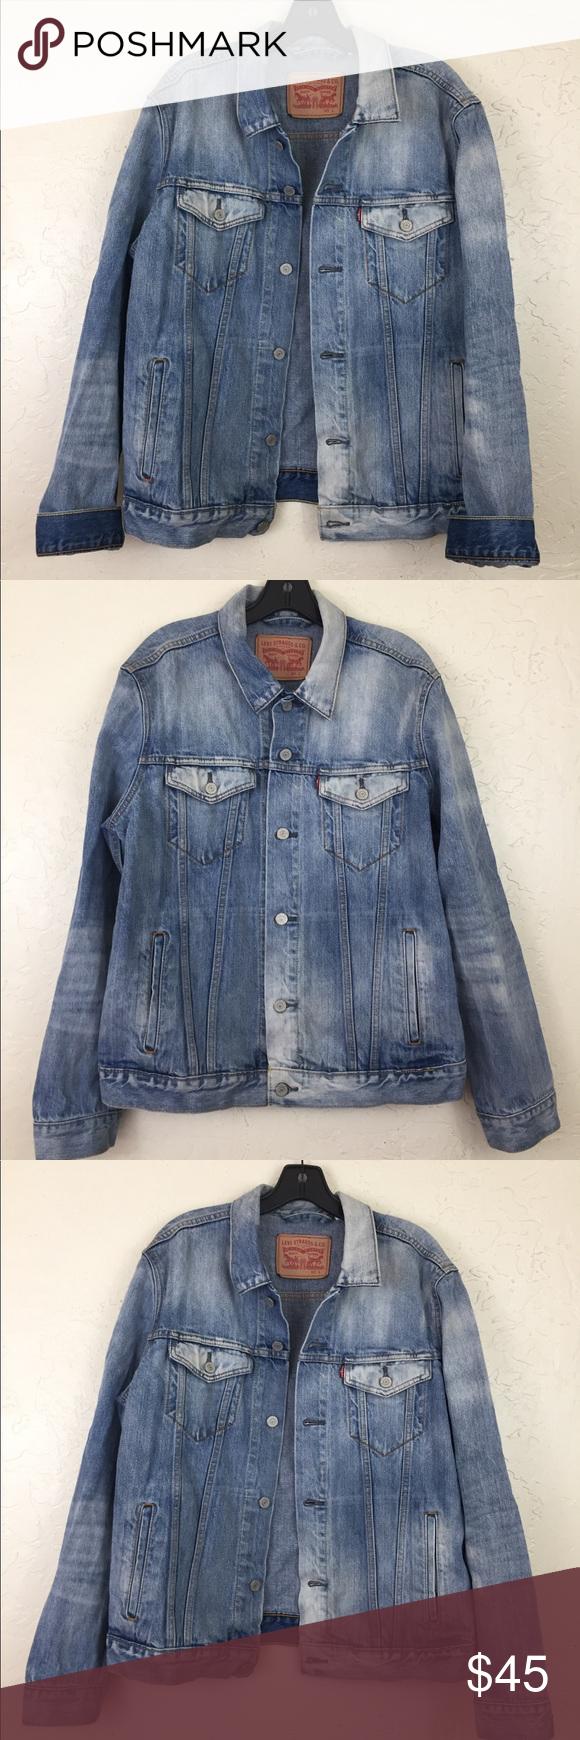 Vintage Levis Jean Jacket Trucker Denim Jacket Light Wash Denim Jacket Levis Jean Jacket Denim Jacket